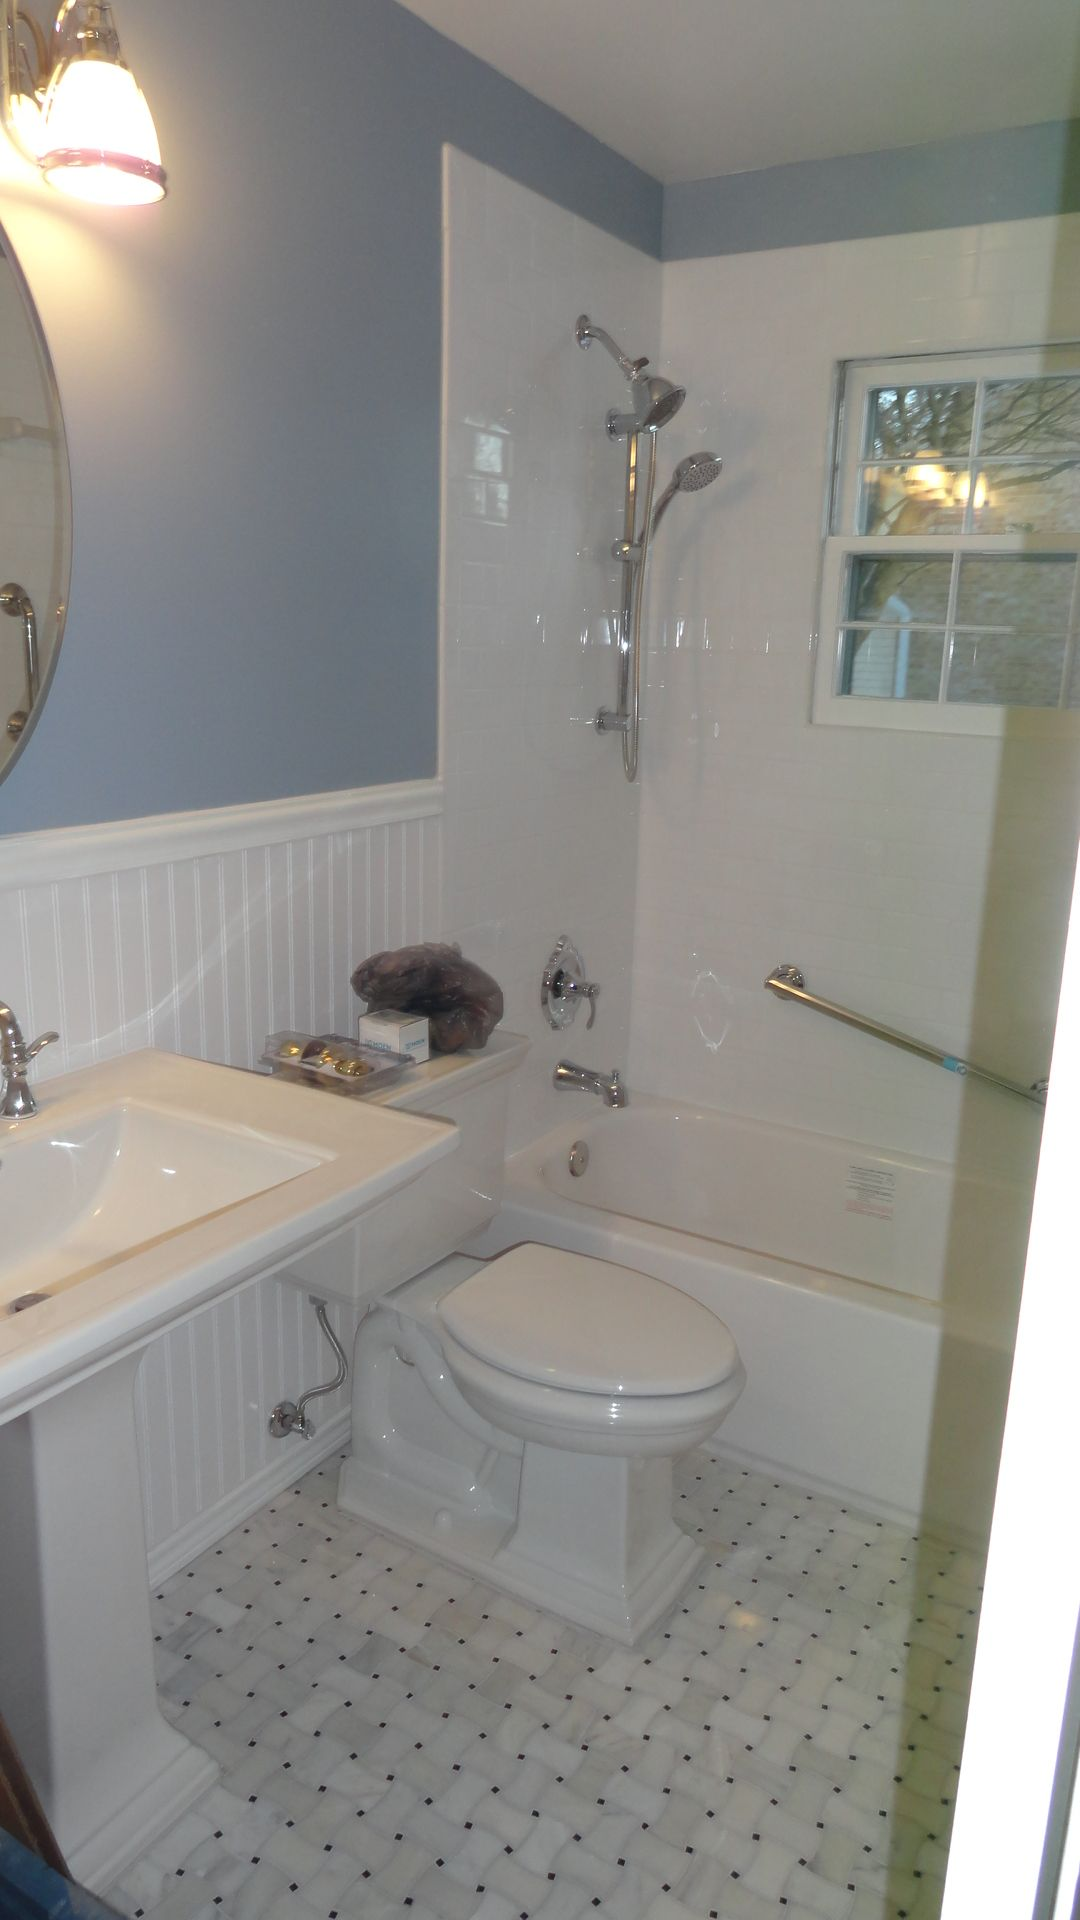 30 Kohler Memoirs Pedestal Sink And Kohler Memoirs Toilet